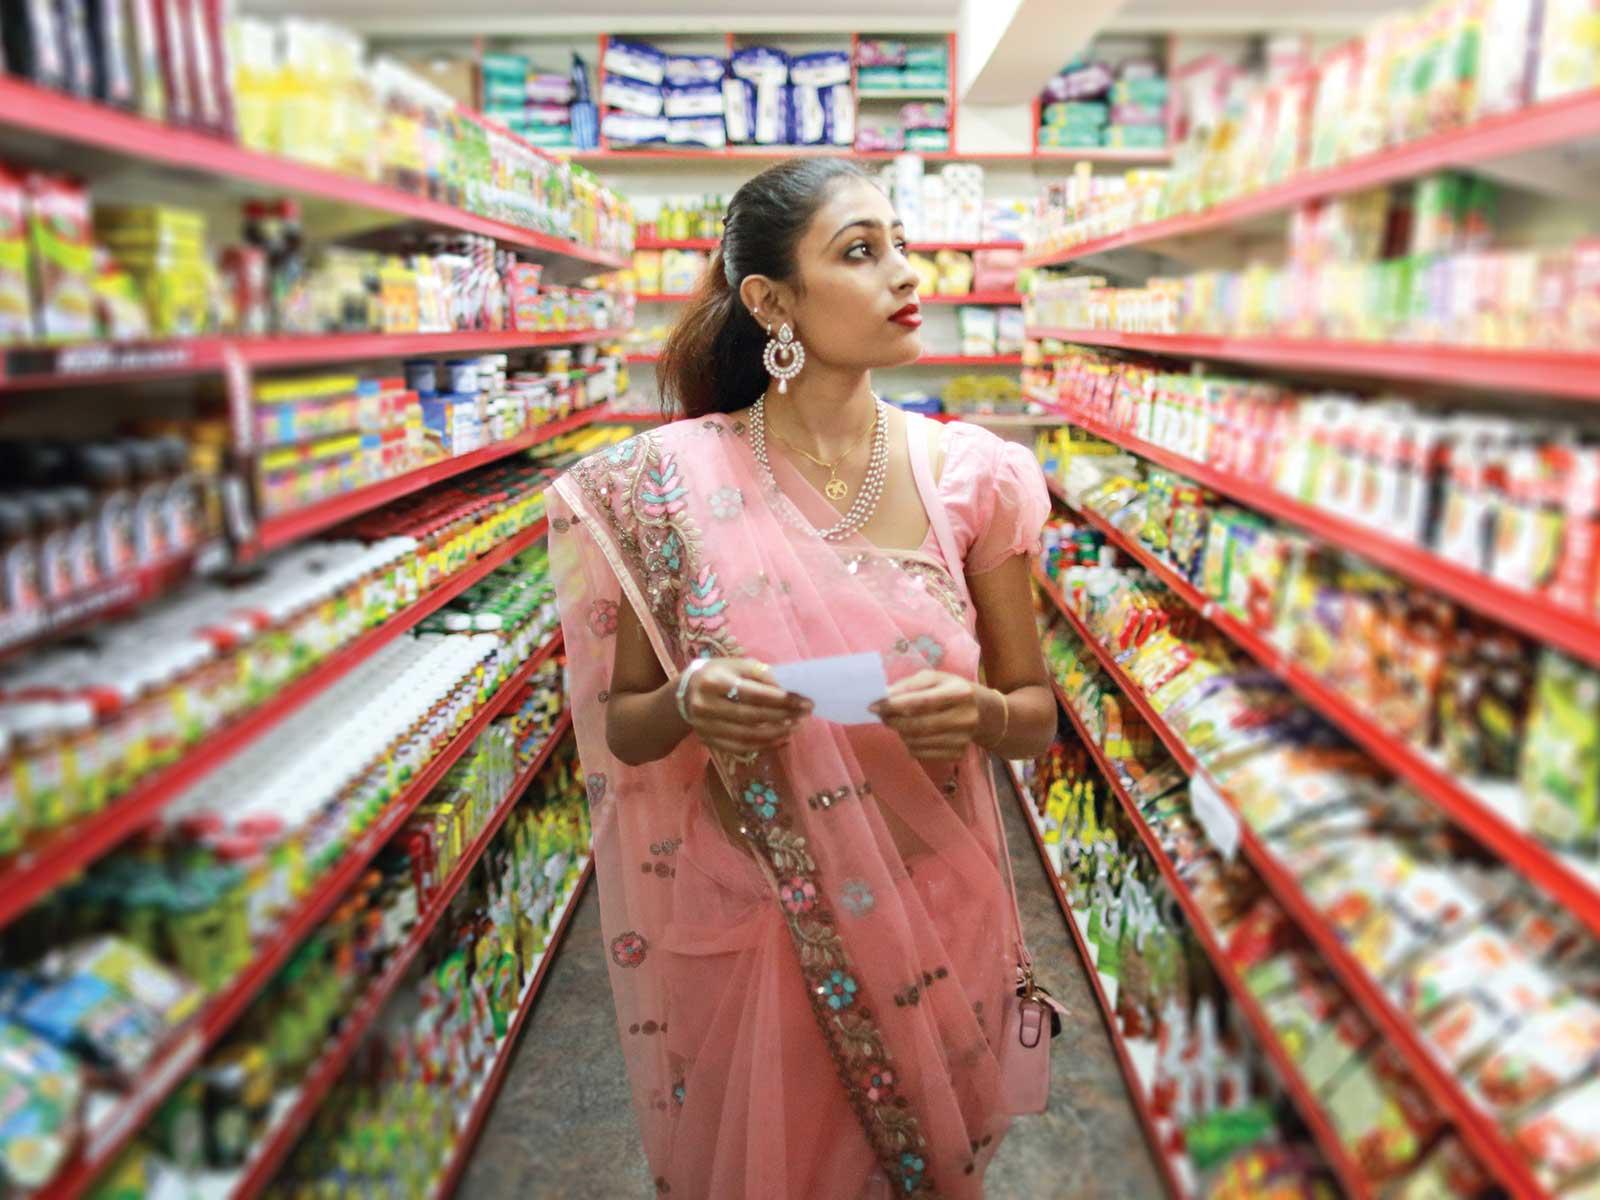 Woman in market shopping